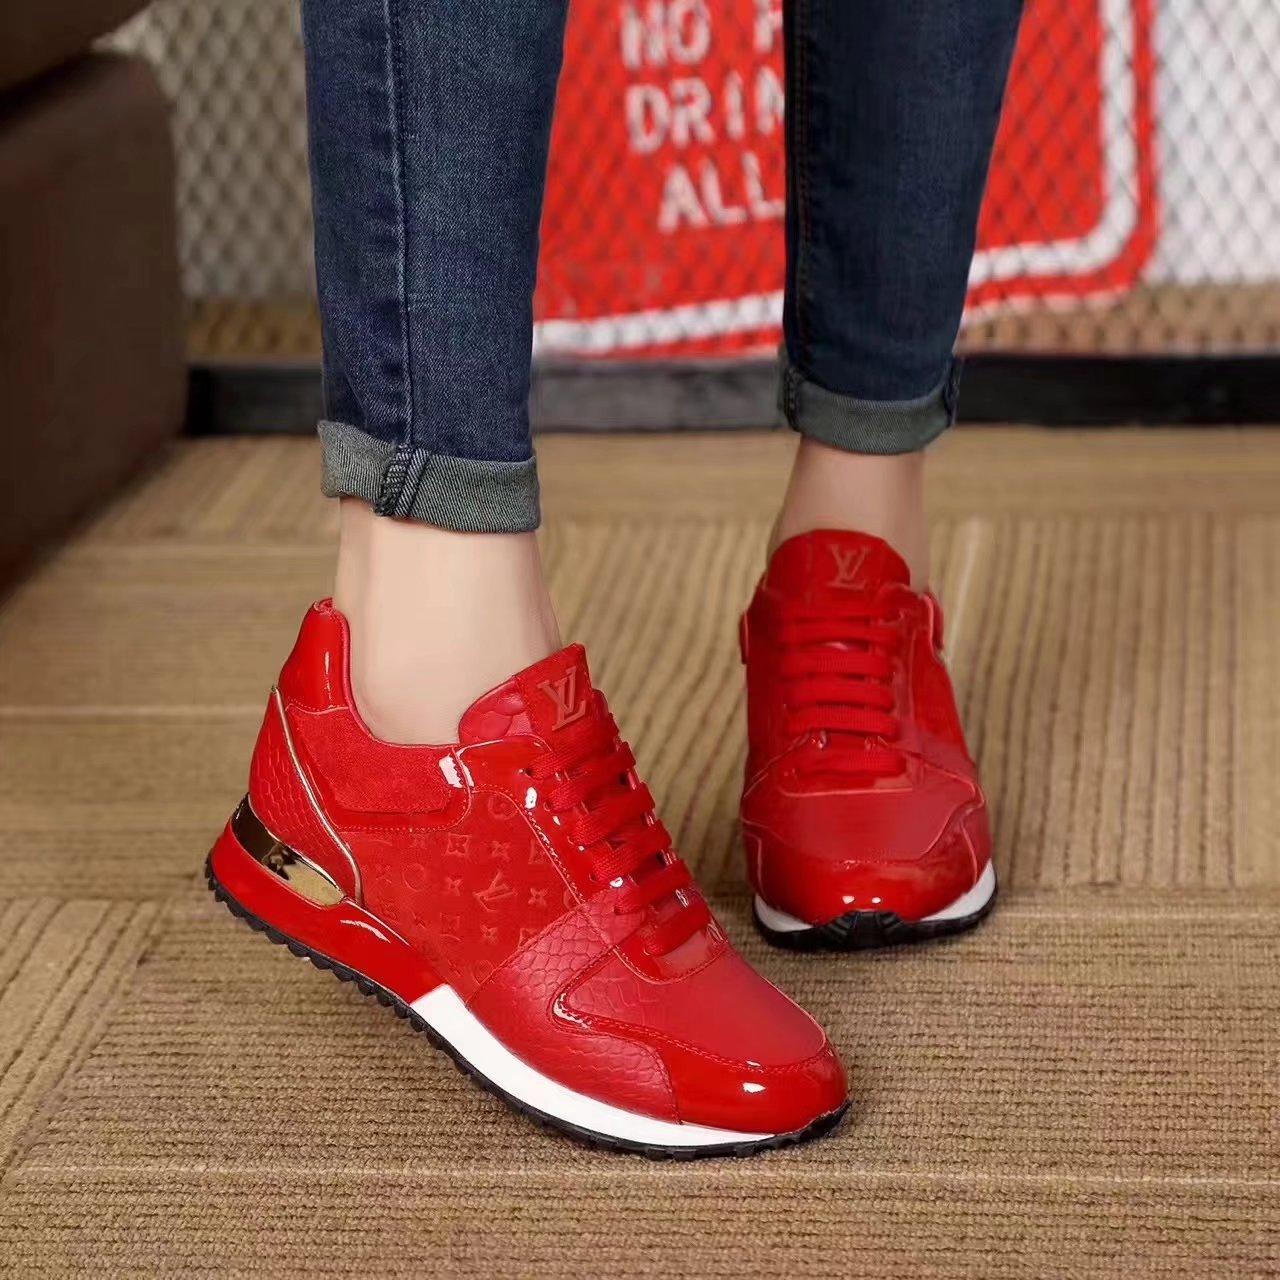 Sneakers louis vuitton homme damier